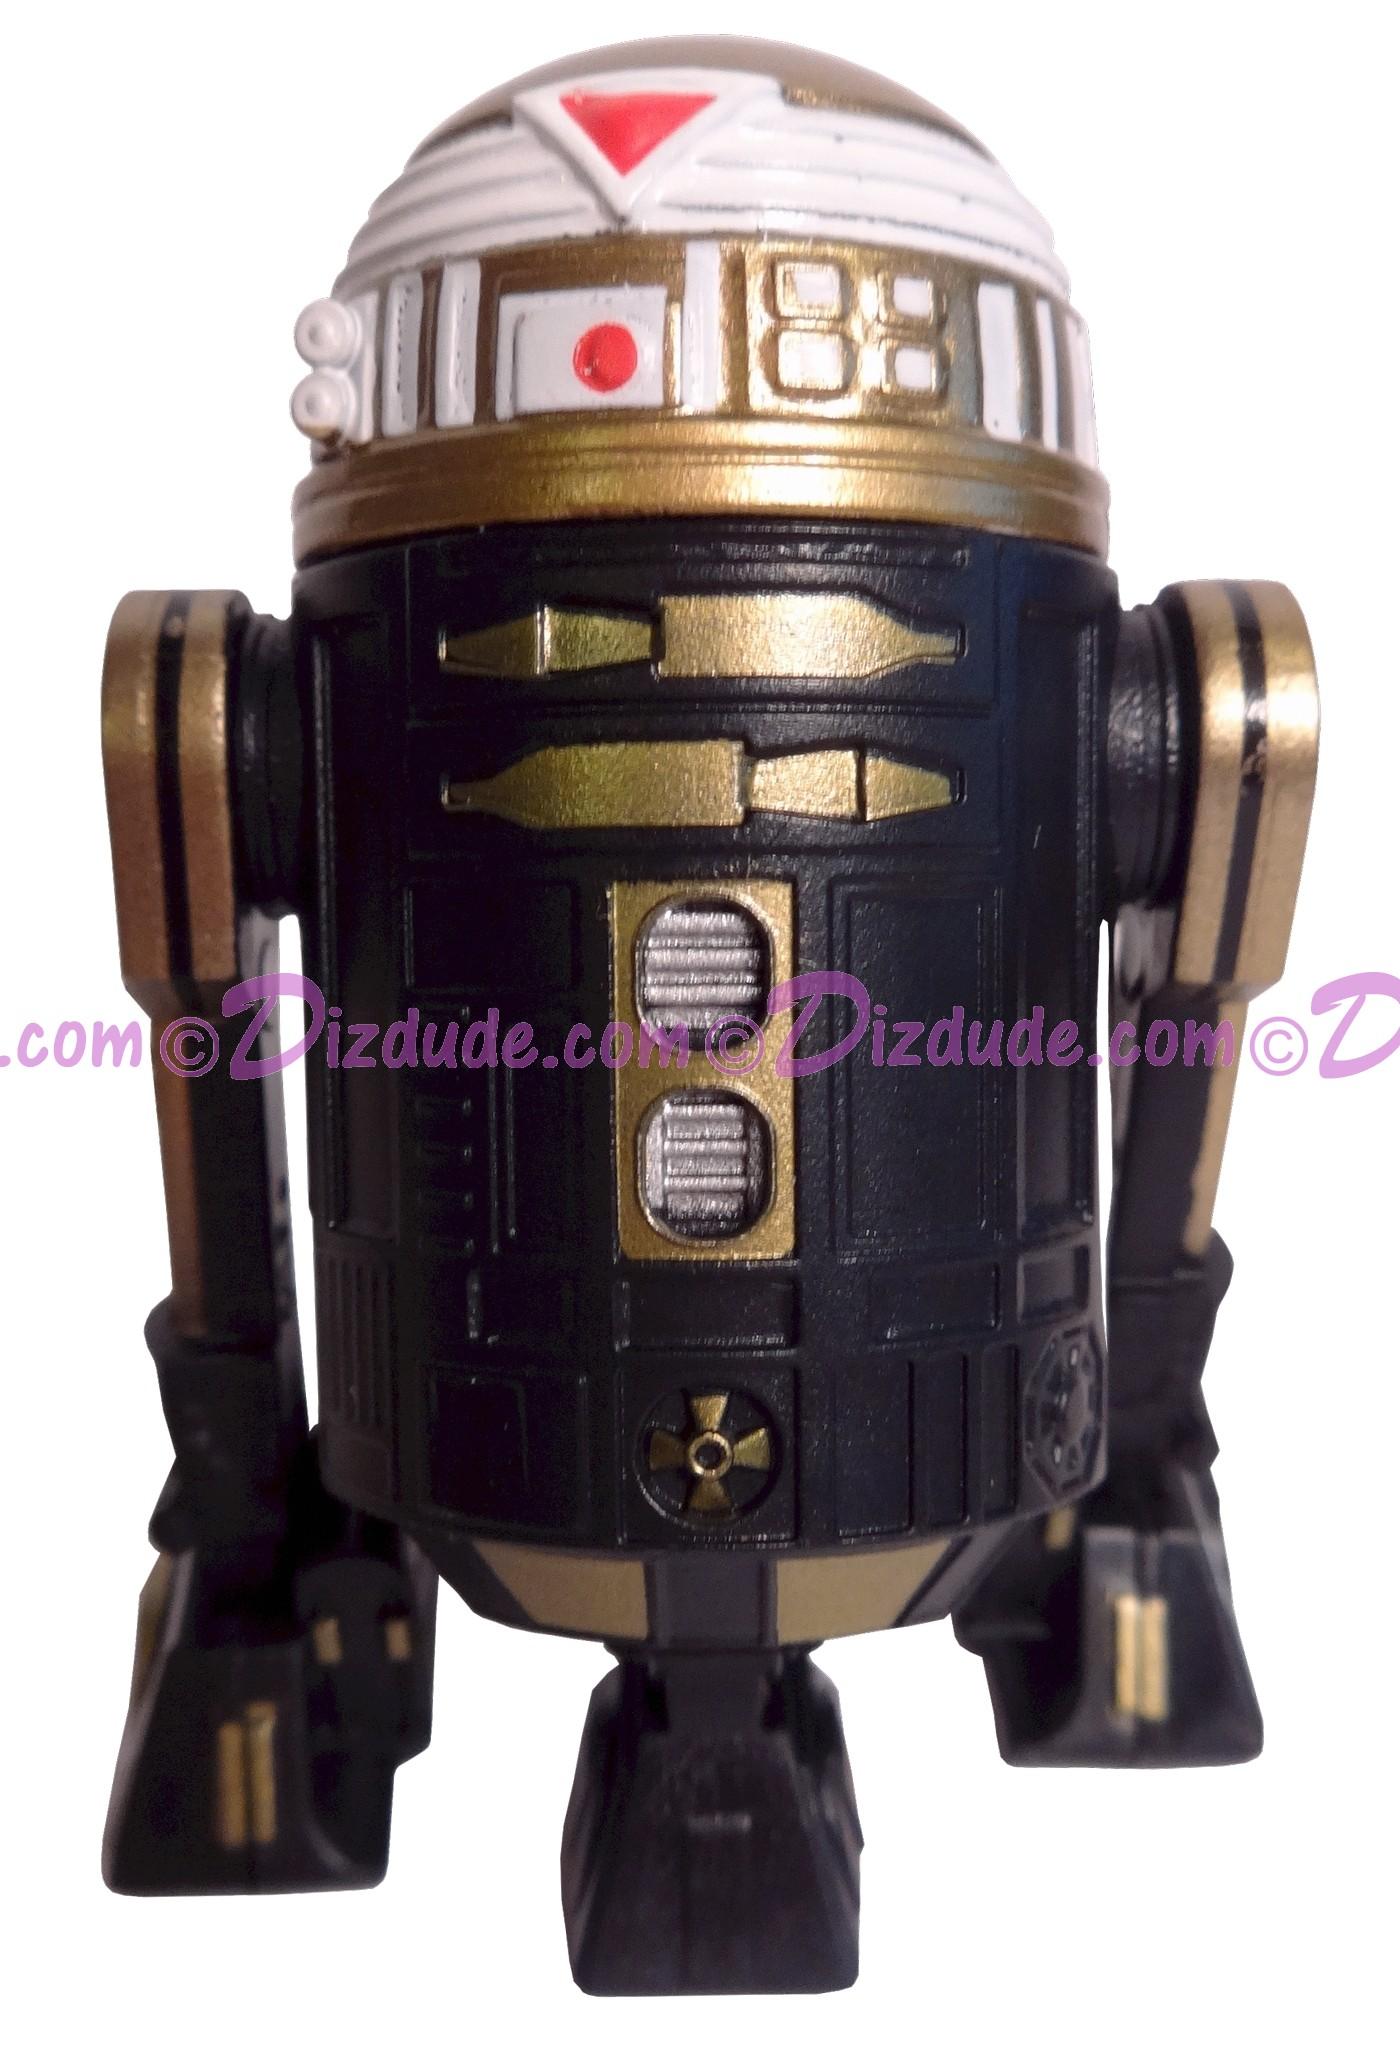 R7 Black & Gold Astromech Droid ~ Pick-A-Hat ~ Series 2 from Disney Star Wars Build-A-Droid Factory © Dizdude.com